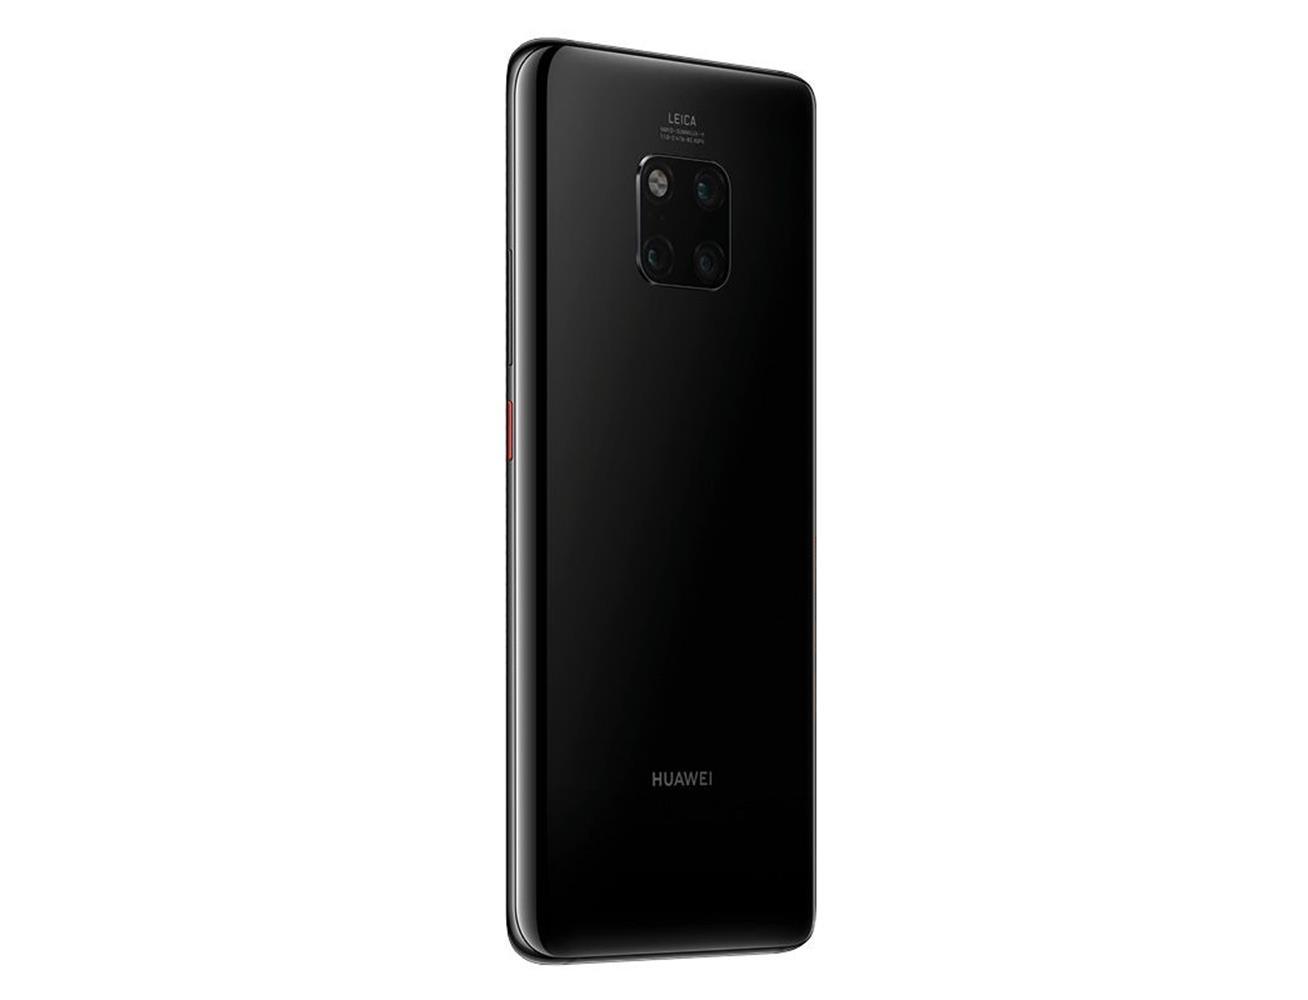 Huawei Mate 20 Pro 128GB Phone - Black| Blink Kuwait